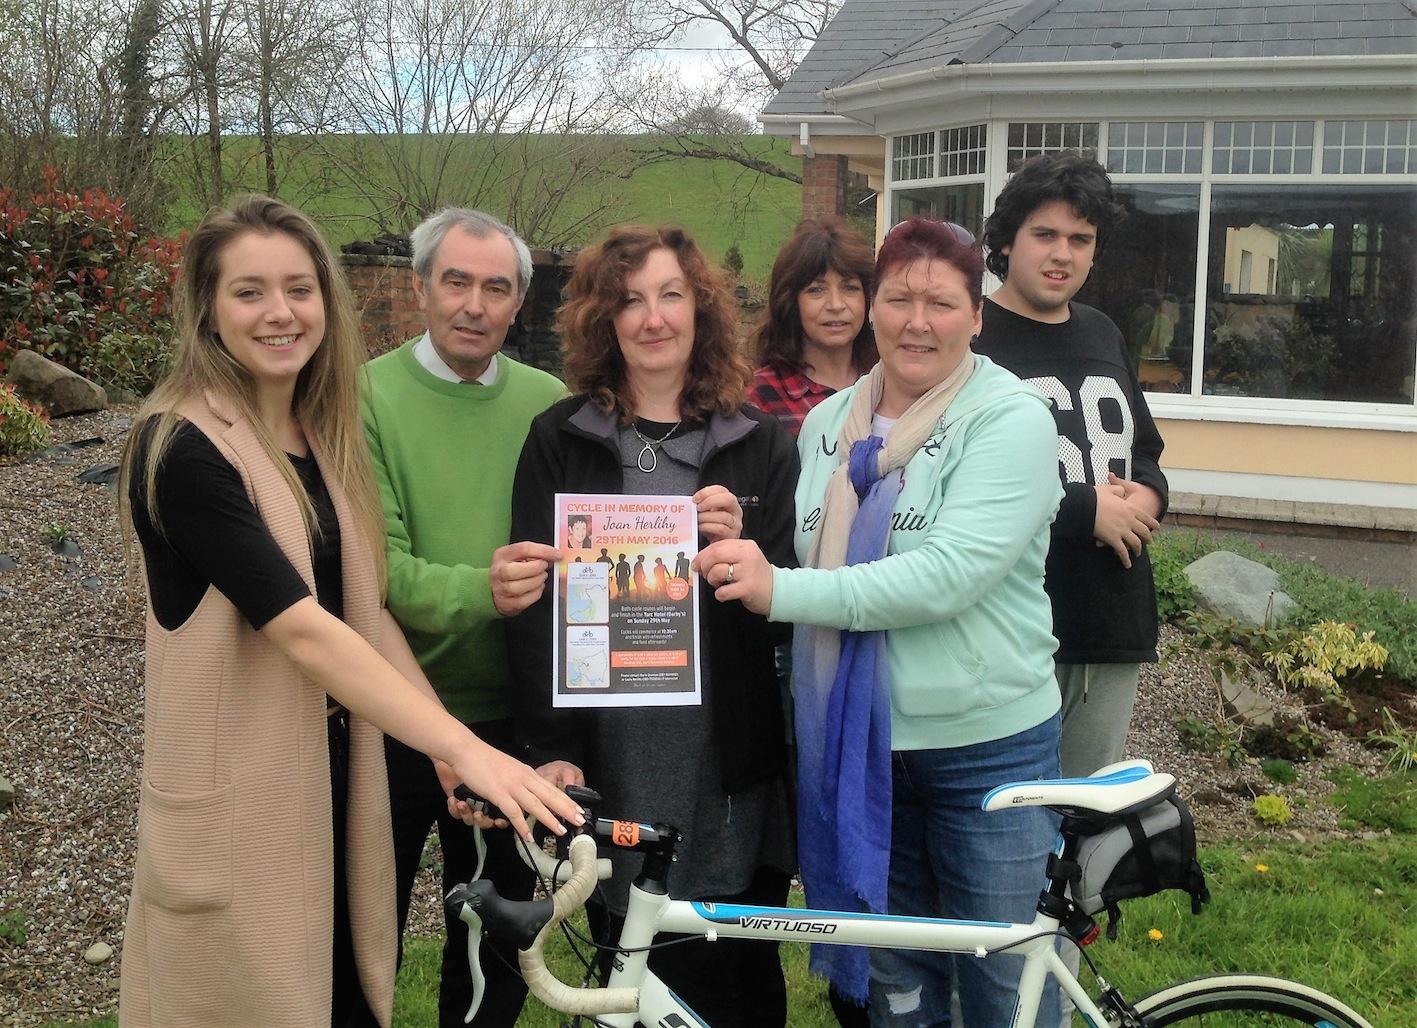 Launching the cycle in memory of Joan Herlihy are Laura Herlihy, Joan's daughter; Christy Lehane; Marie Shannon; Catherine McEniry, Joan's sister; Breda Hickey; and Tom McEniry, Joan's nephew.